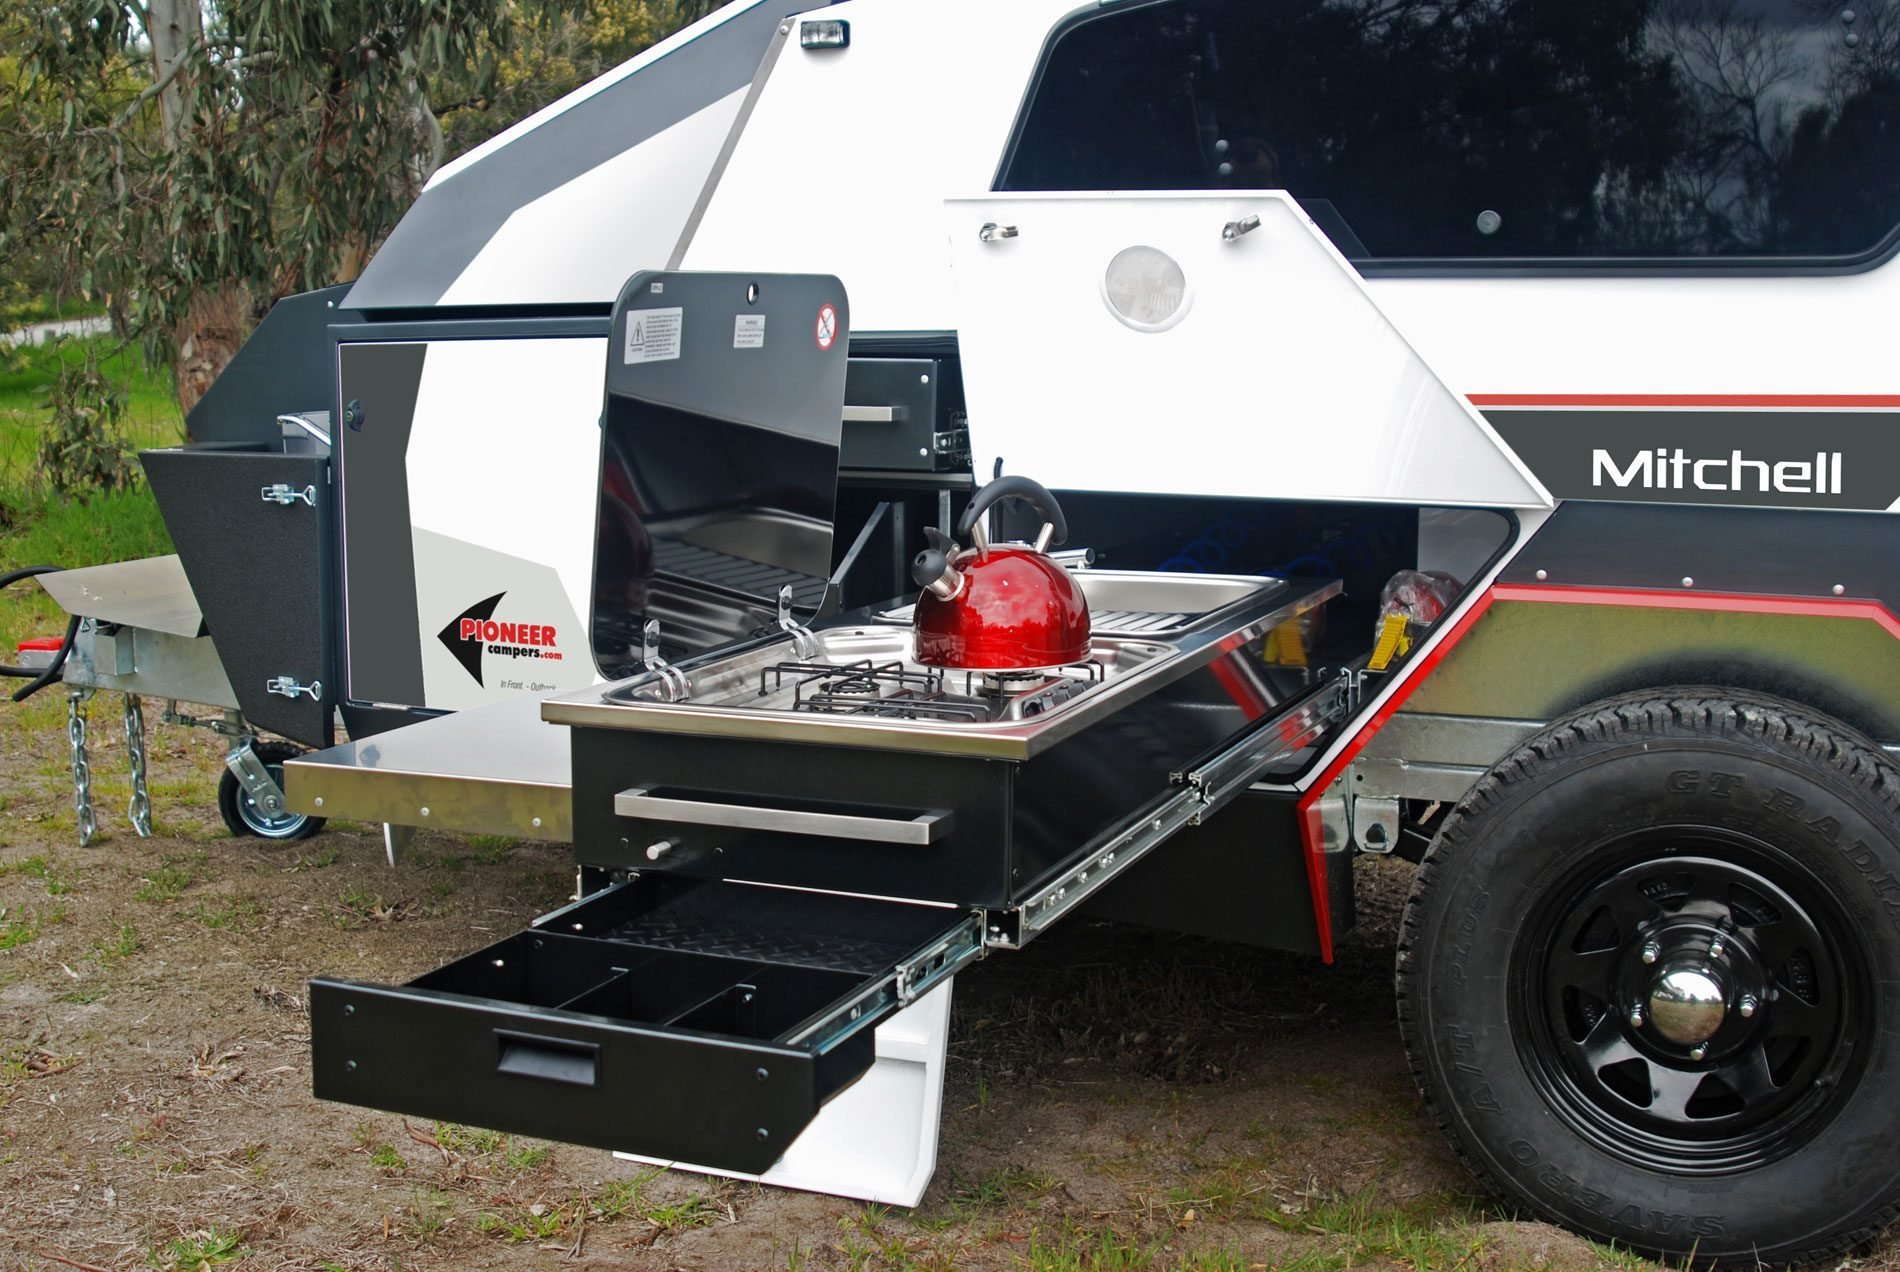 camper-trailers-mitchell-2